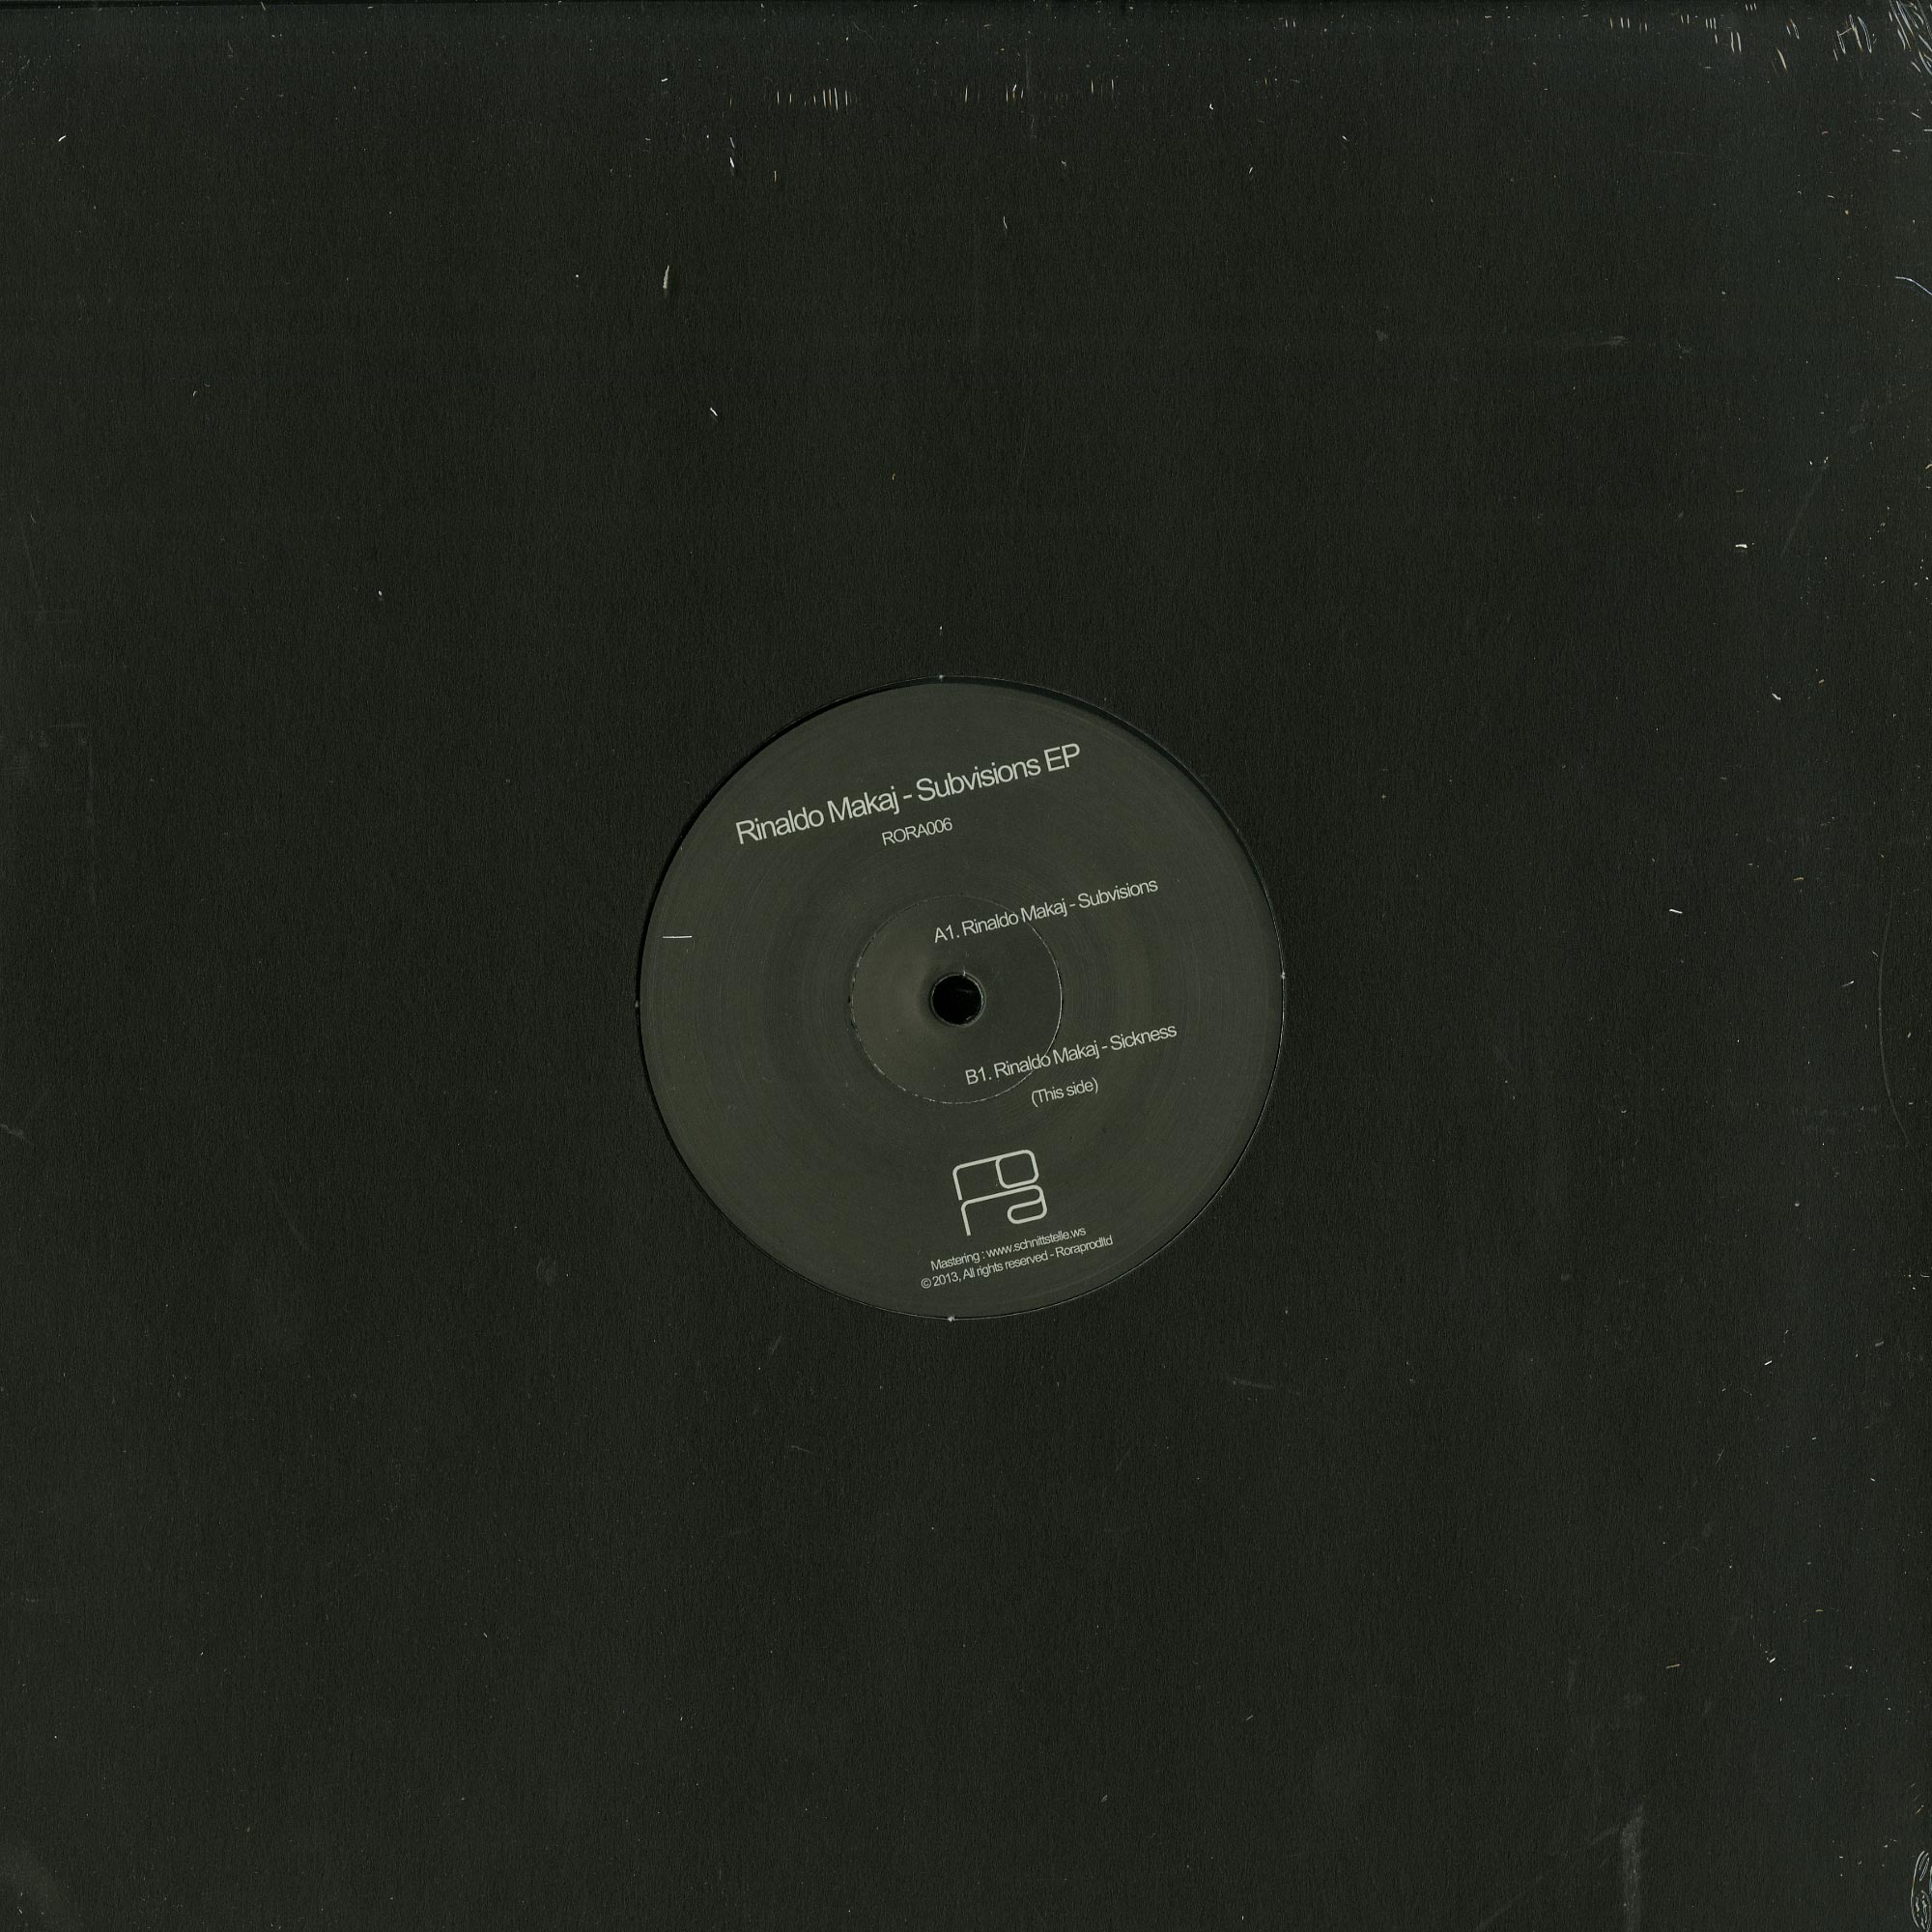 Rinaldo Makaj - SUBVISIONS EP